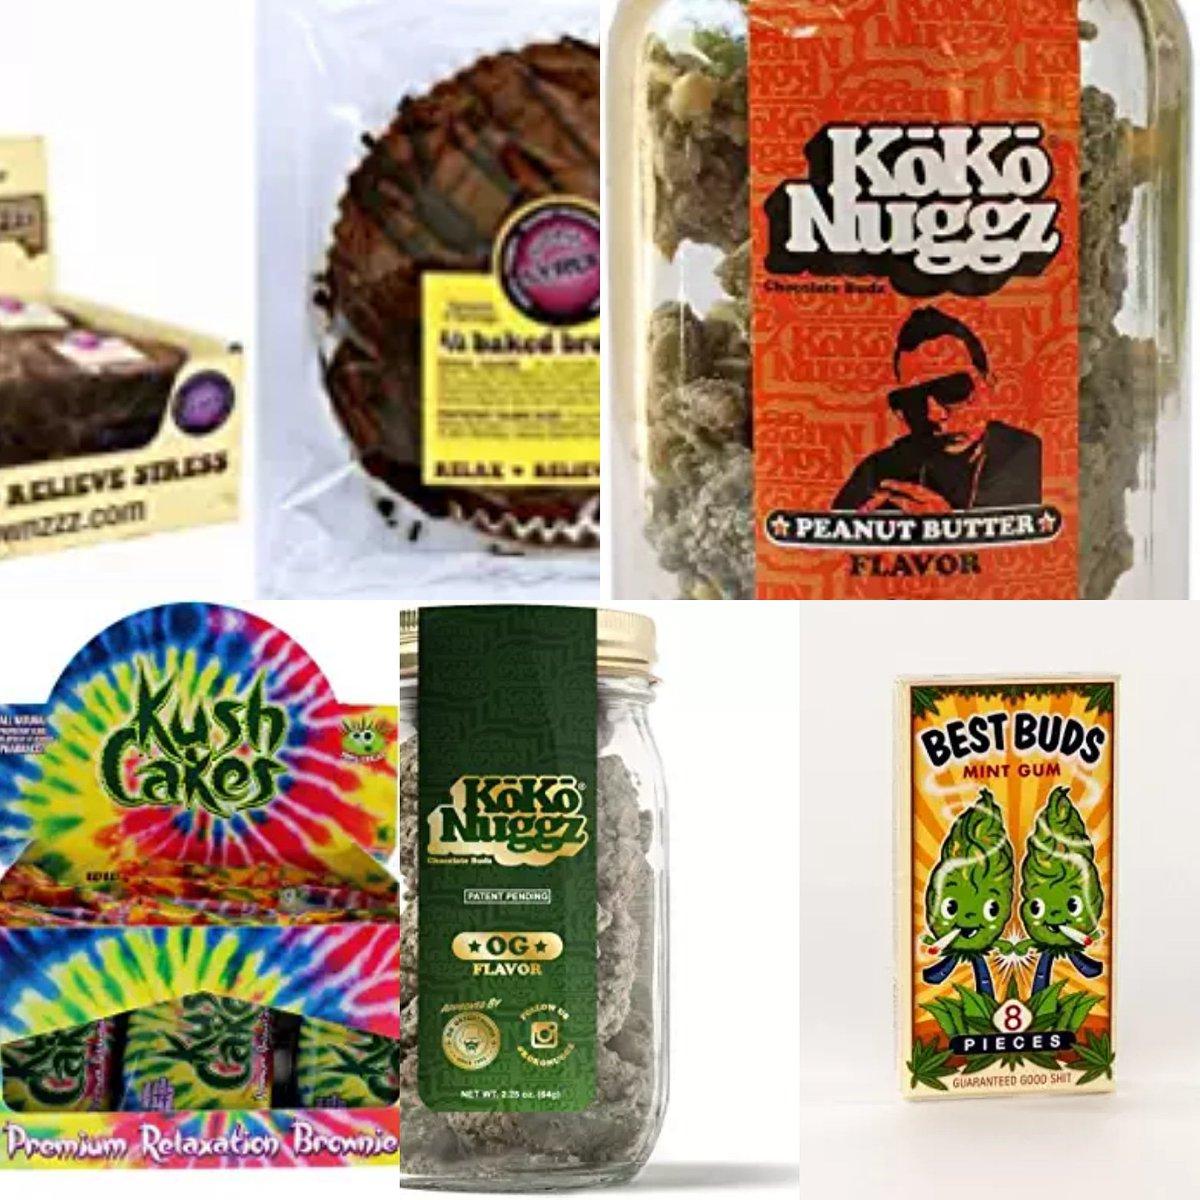 Custom Cars USA has Hemp Candy Shop http://bit.ly/hempcandy #Eriepa #Pittsburgh #hemp ##hempcandy #kushcandy #candy #customcarsusa #customcarsusa127 #amazon